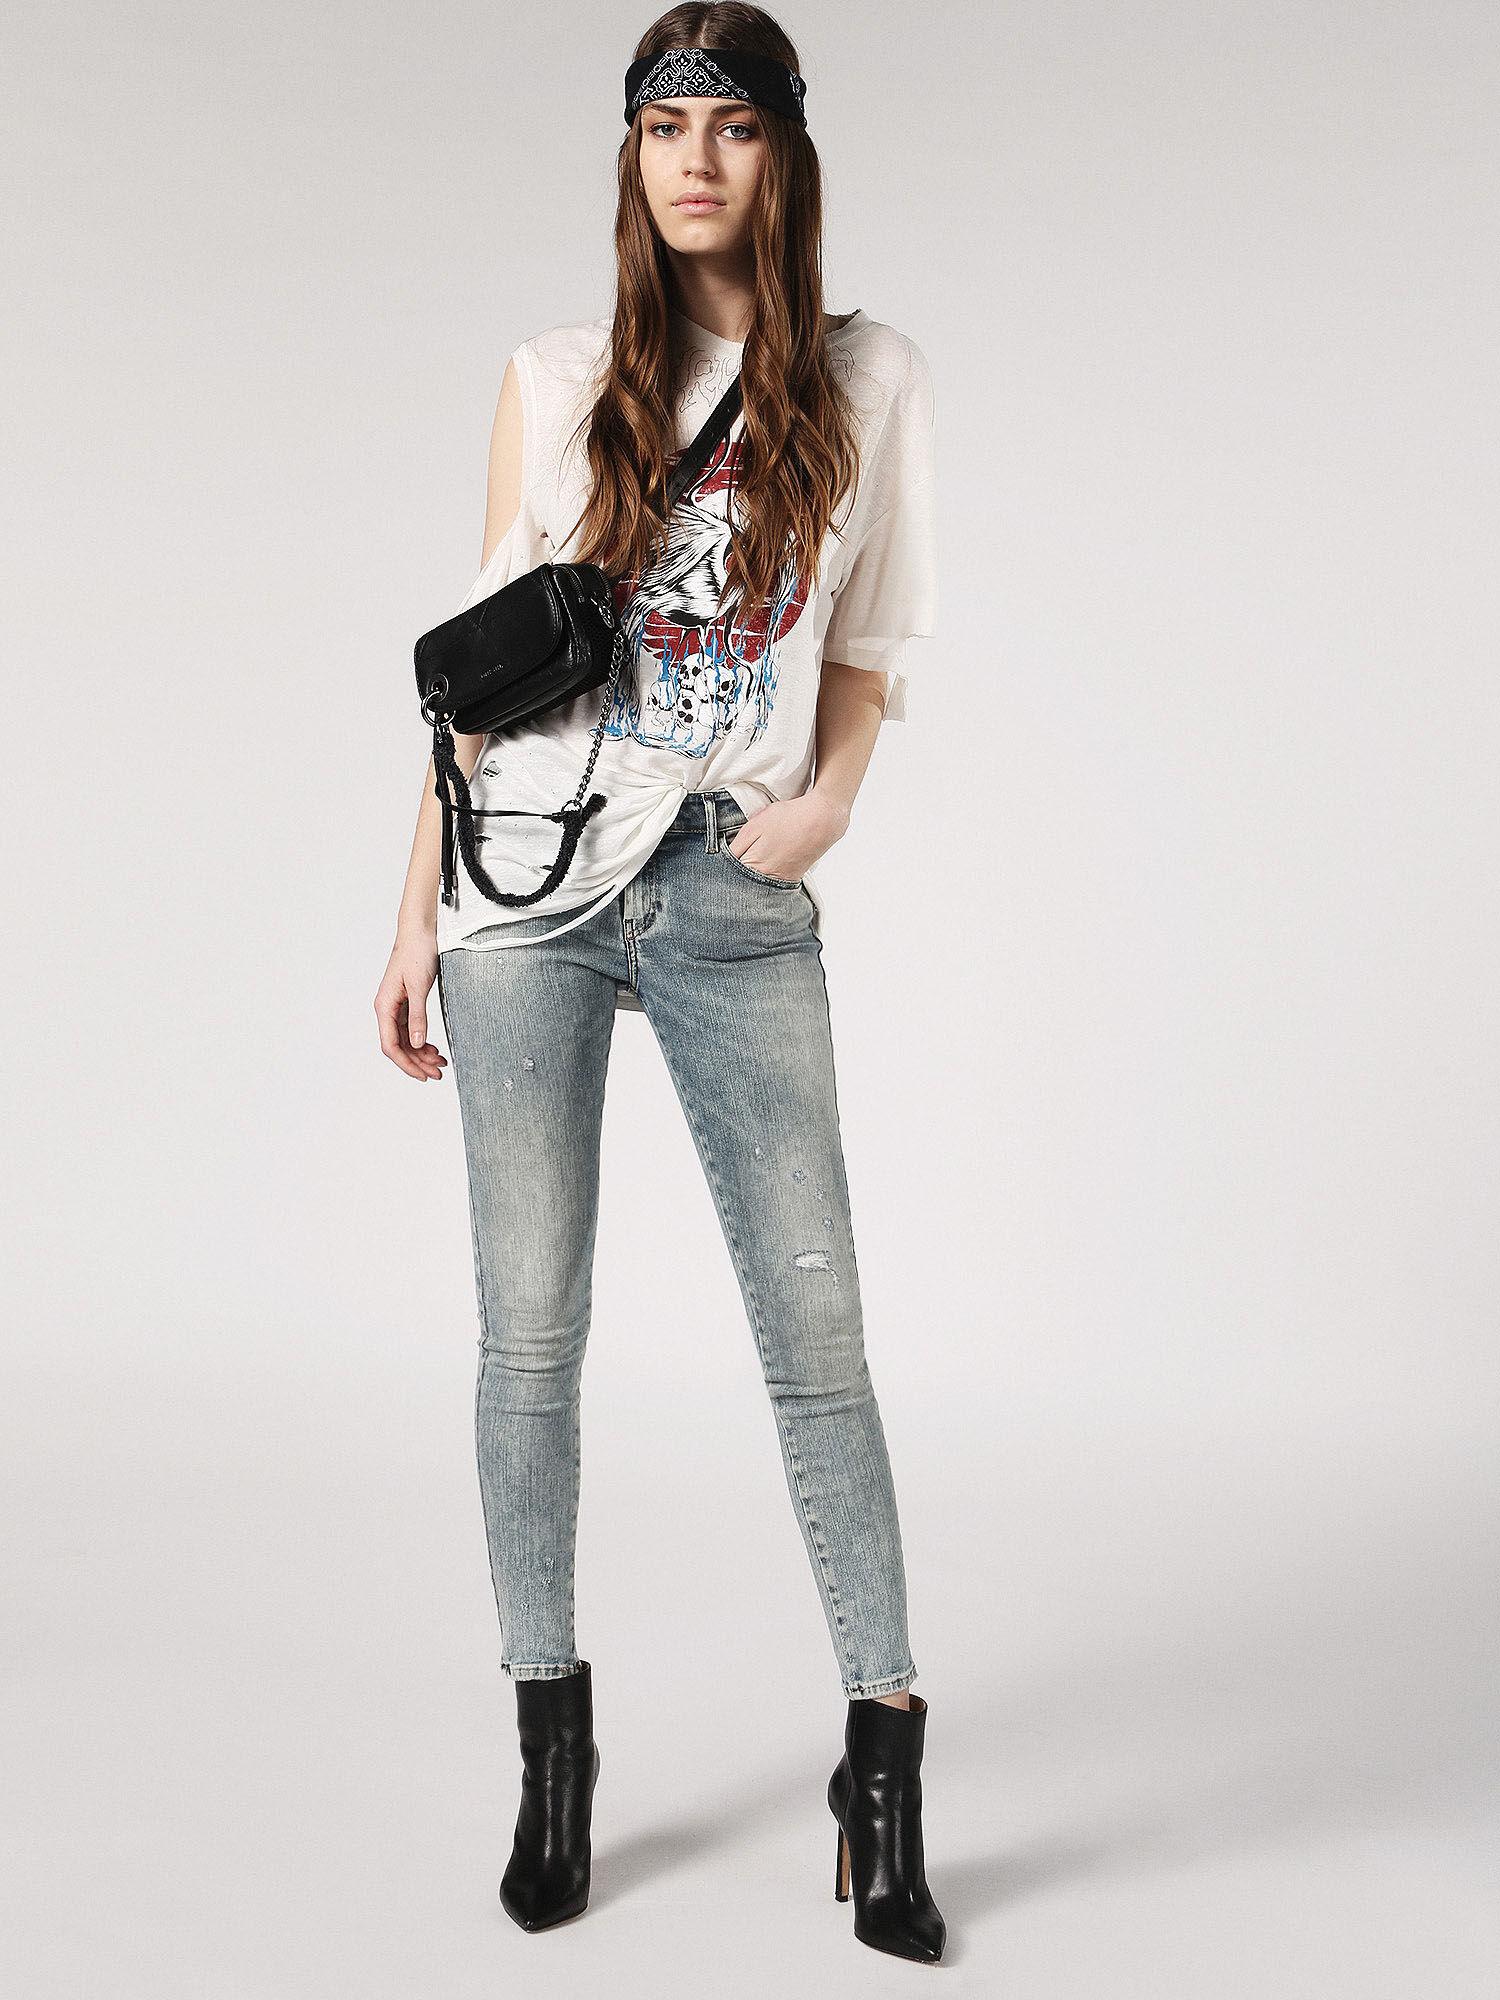 Diesel Skinzee Skinny Jeans Grey Womens Jeans Jeans for Women COLOUR-grey